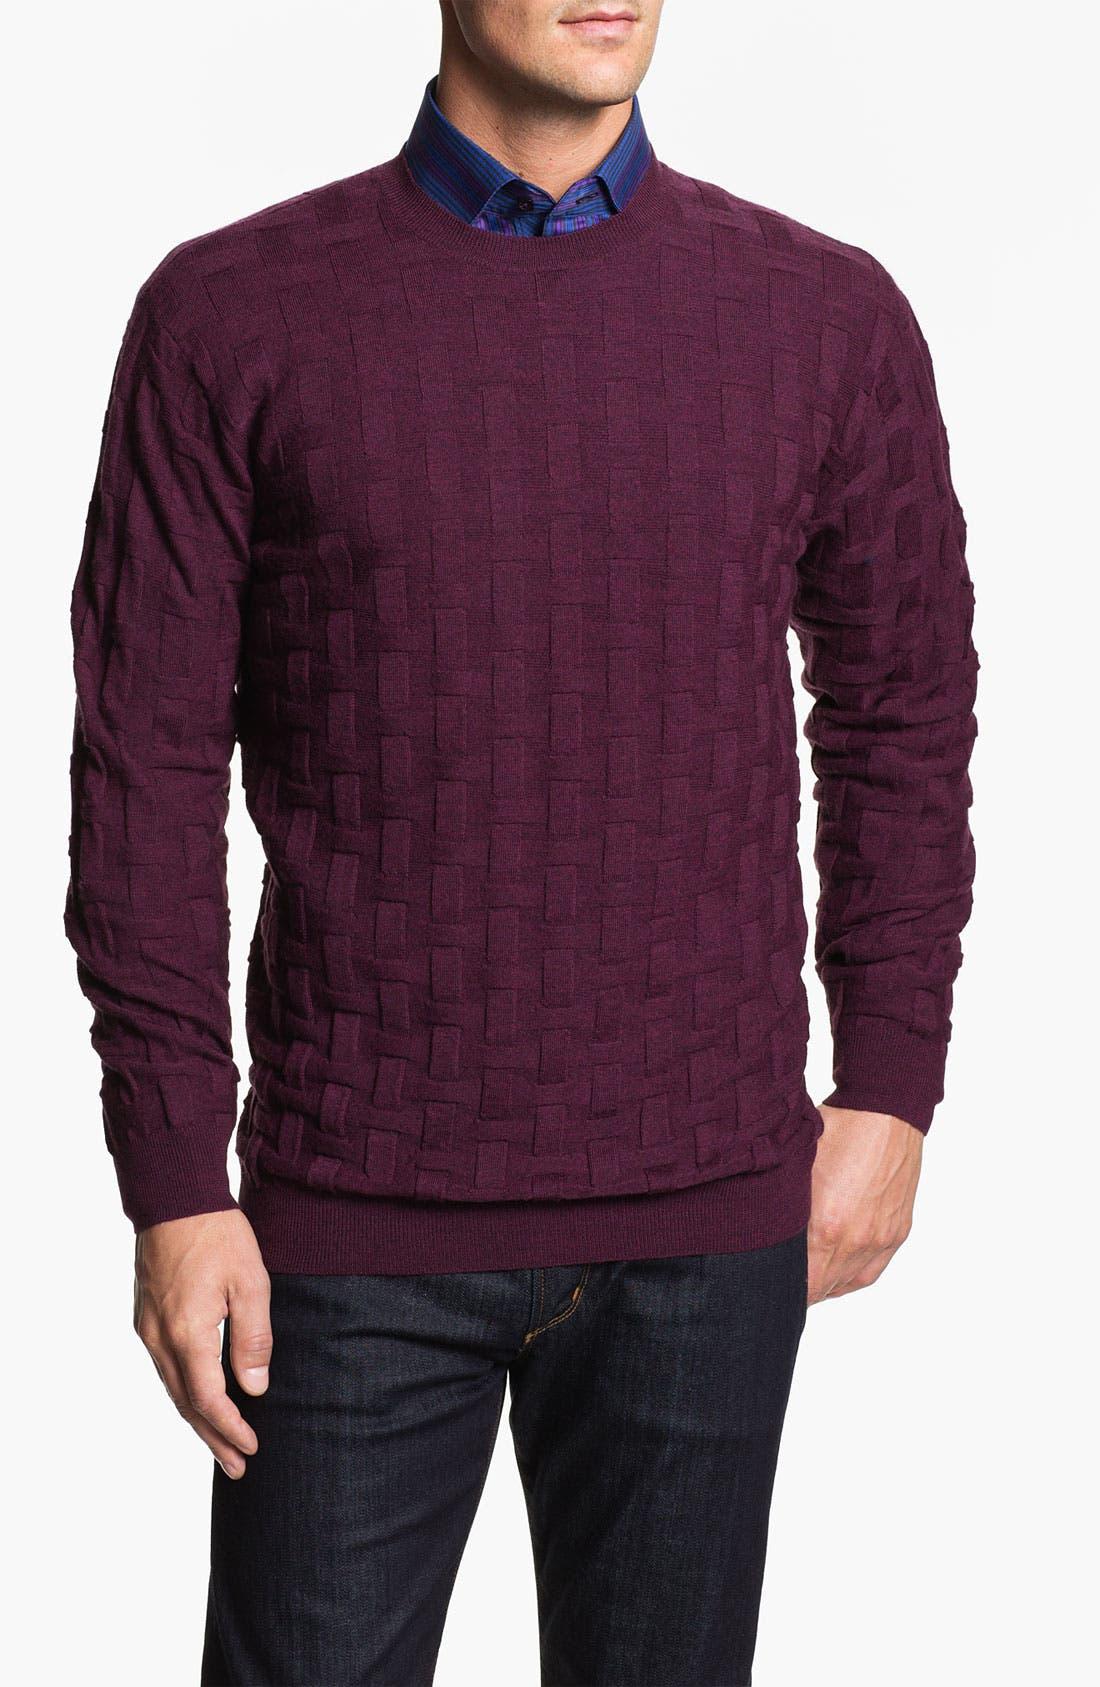 Main Image - Bugatchi Uomo Crewneck Merino Wool Sweater